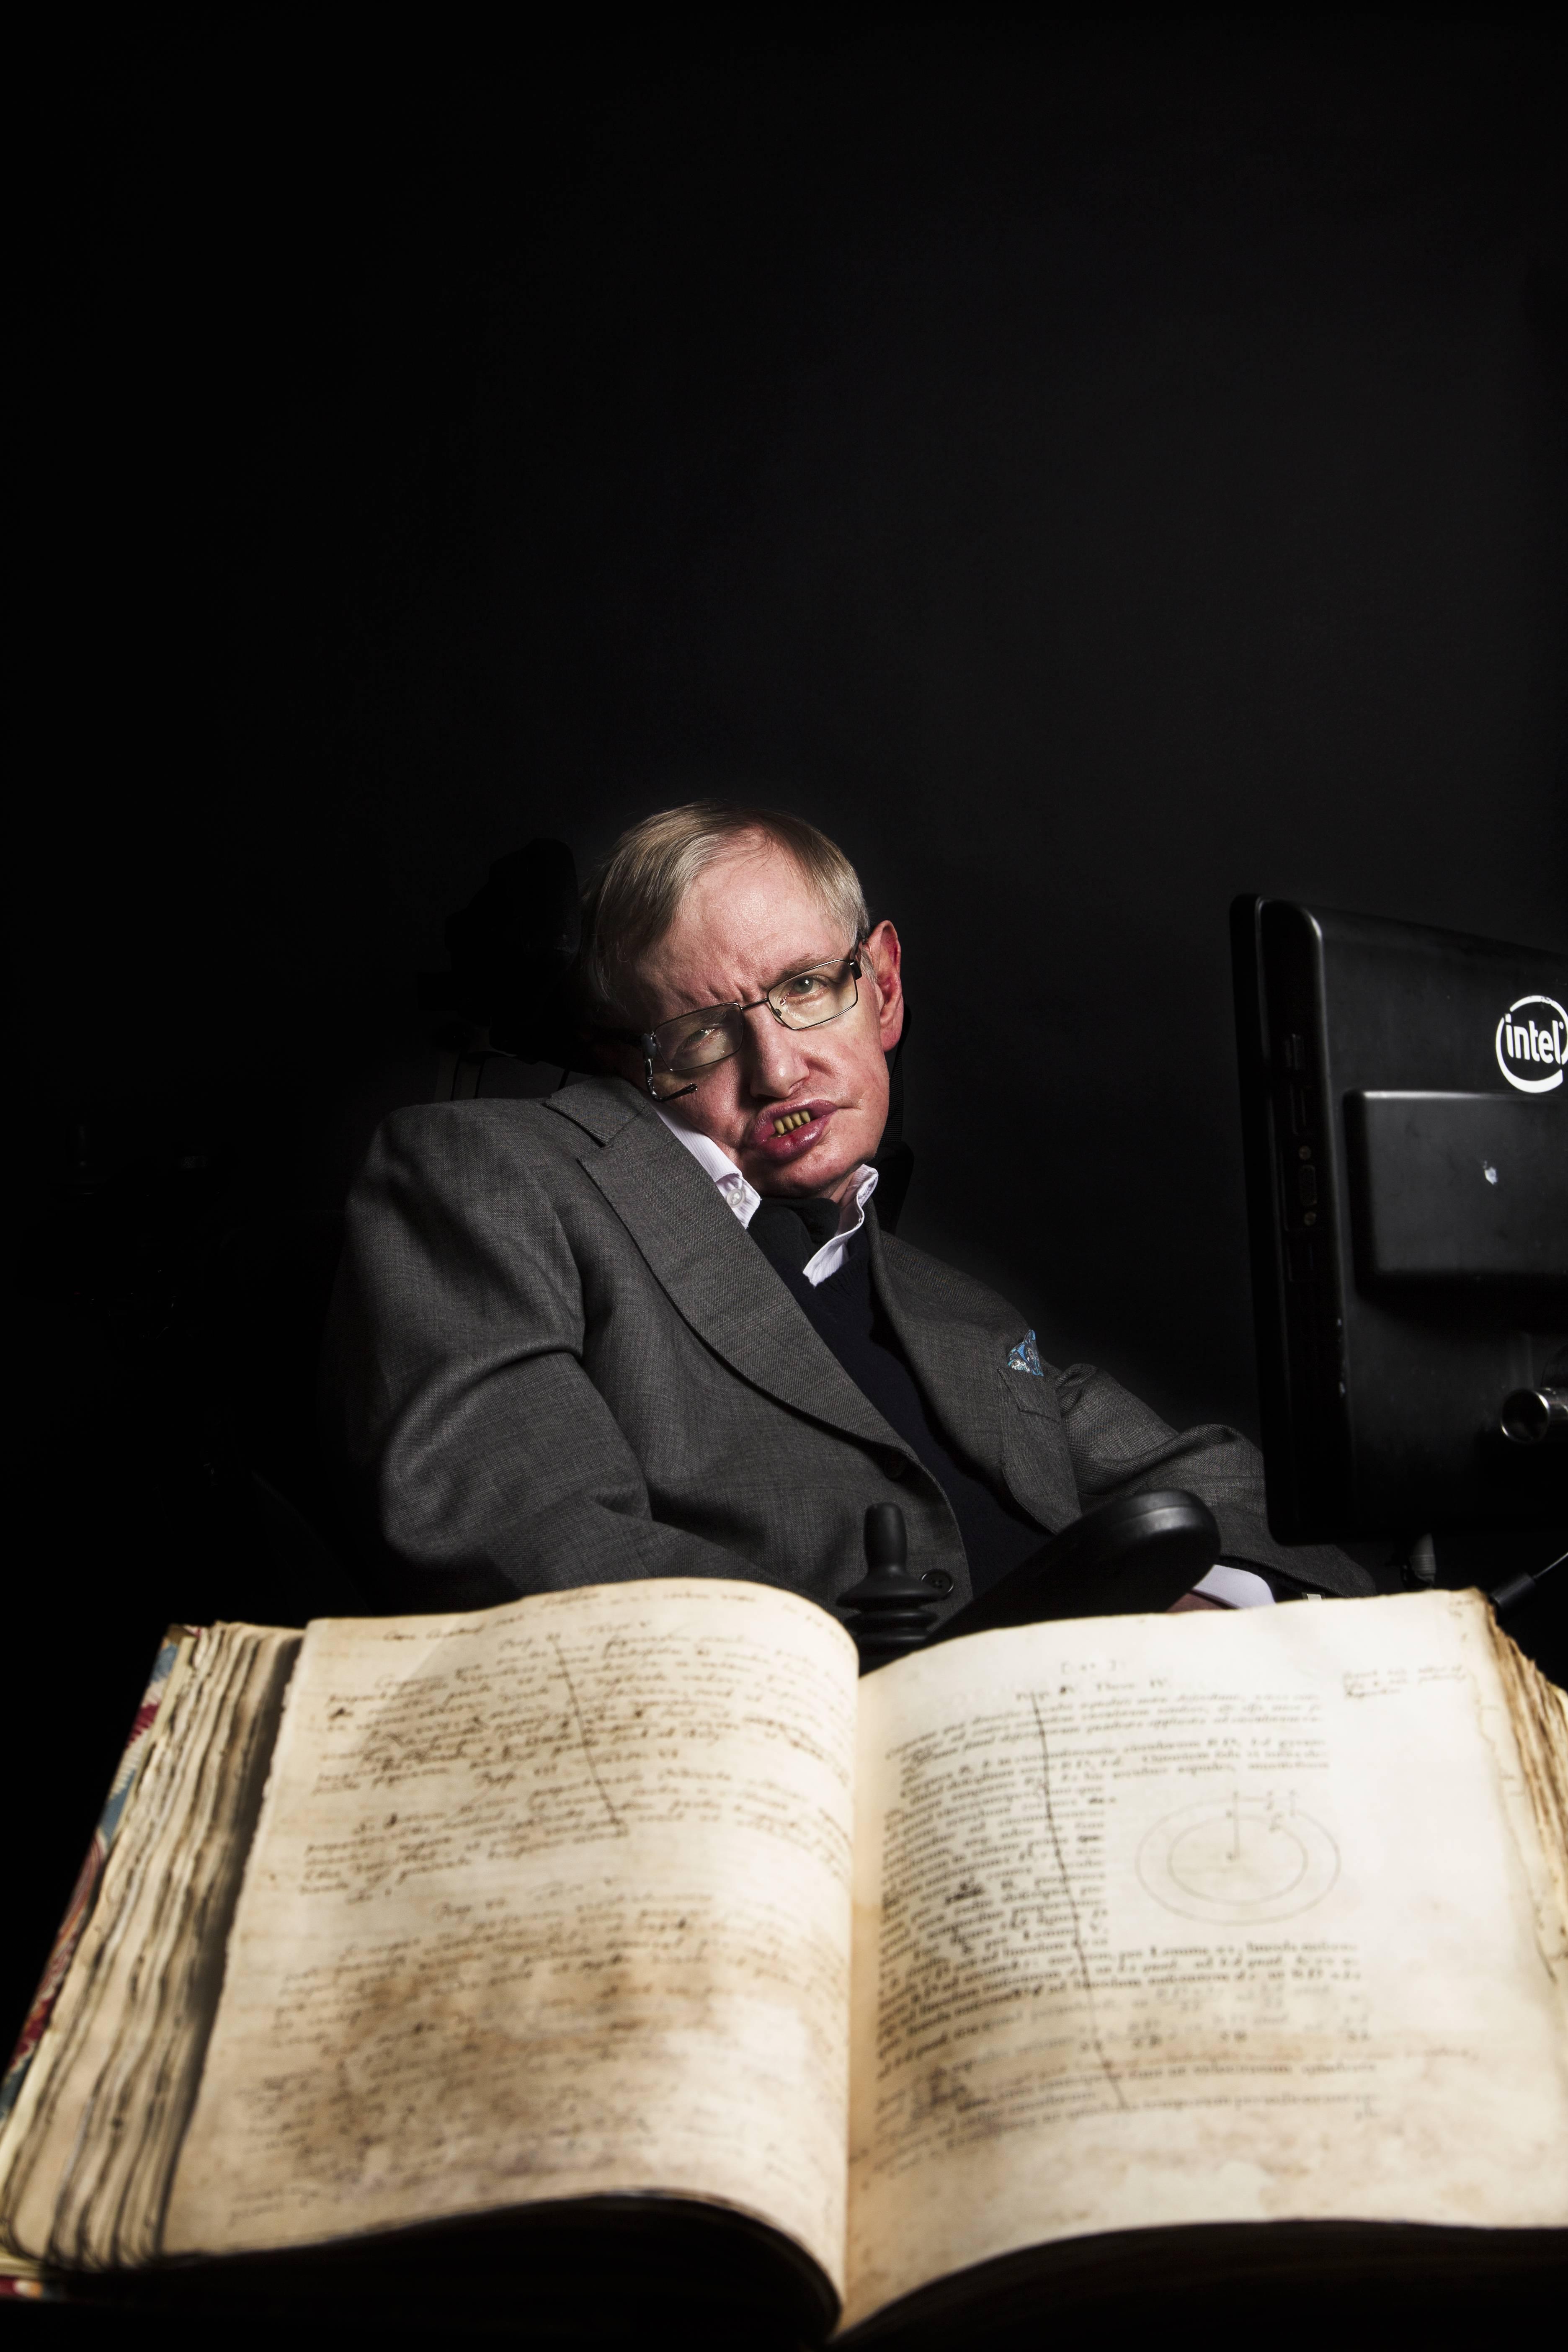 Professor Stephen Hawking returns to Oxford